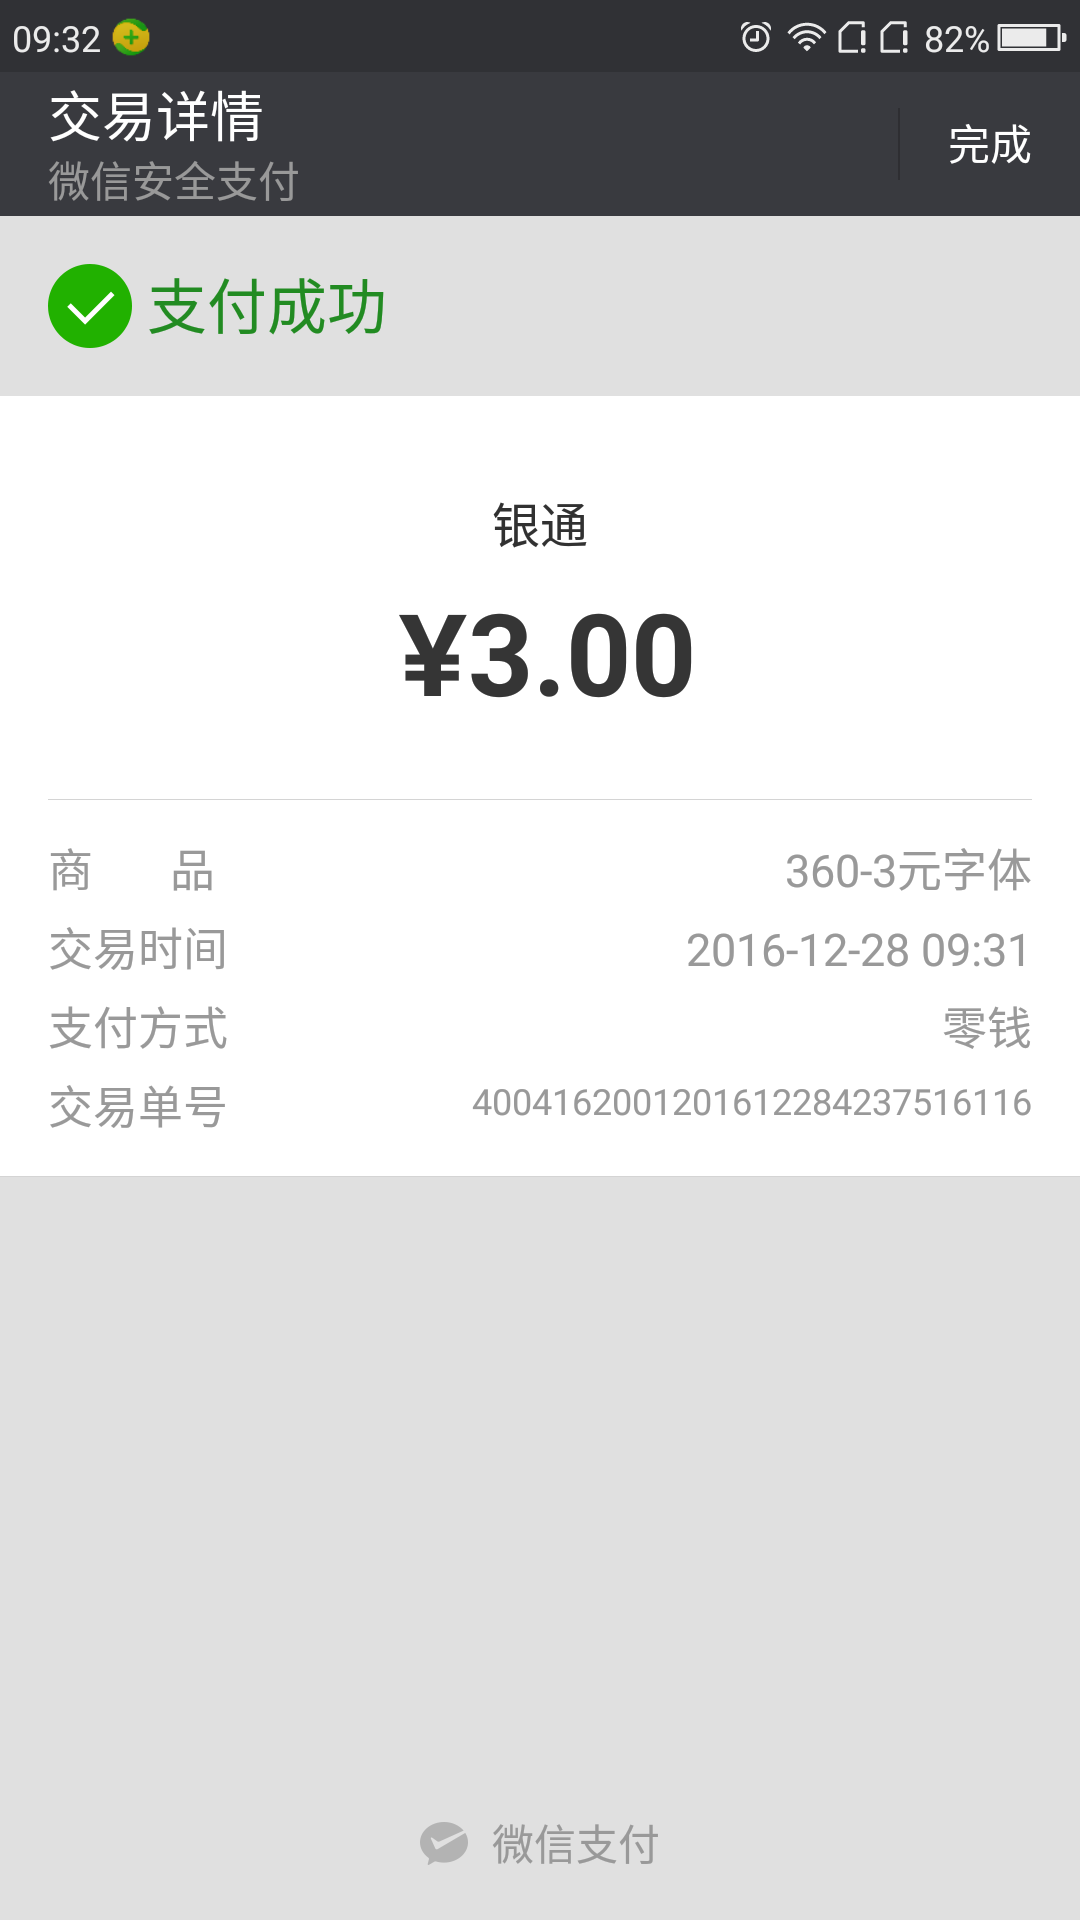 Screenshot_2016-12-28-09-32-11.png